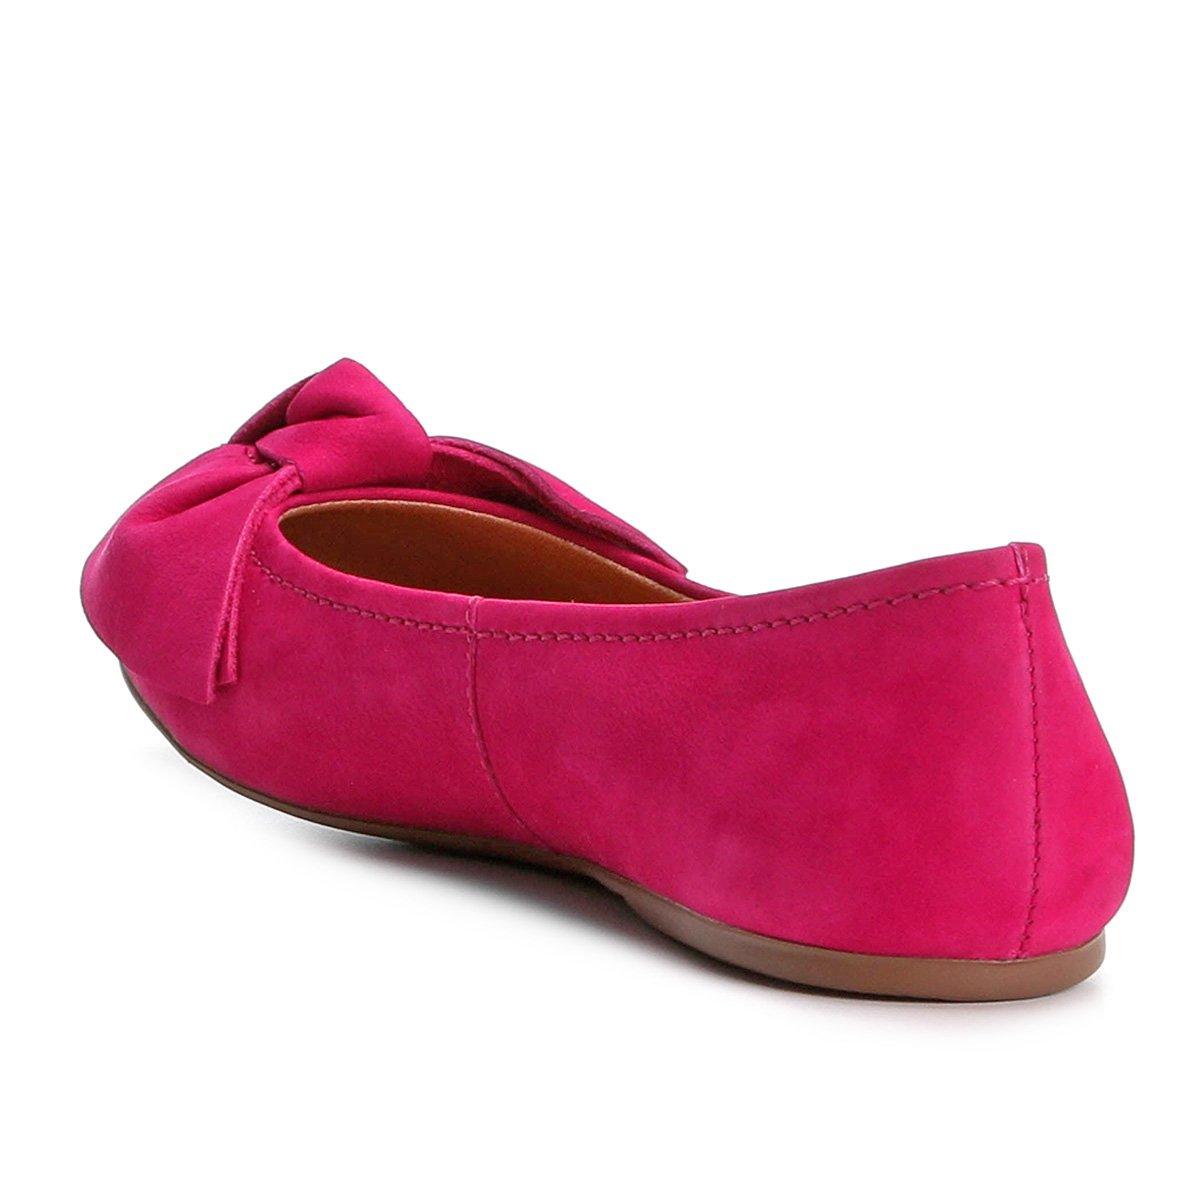 Nobuck Couro Loucos Pink Pink Loucos Santos Couro Laço Sapatilha Sapatilha Laço amp; Feminina Santos amp; Feminina Nobuck Sapatilha xSwBAqC